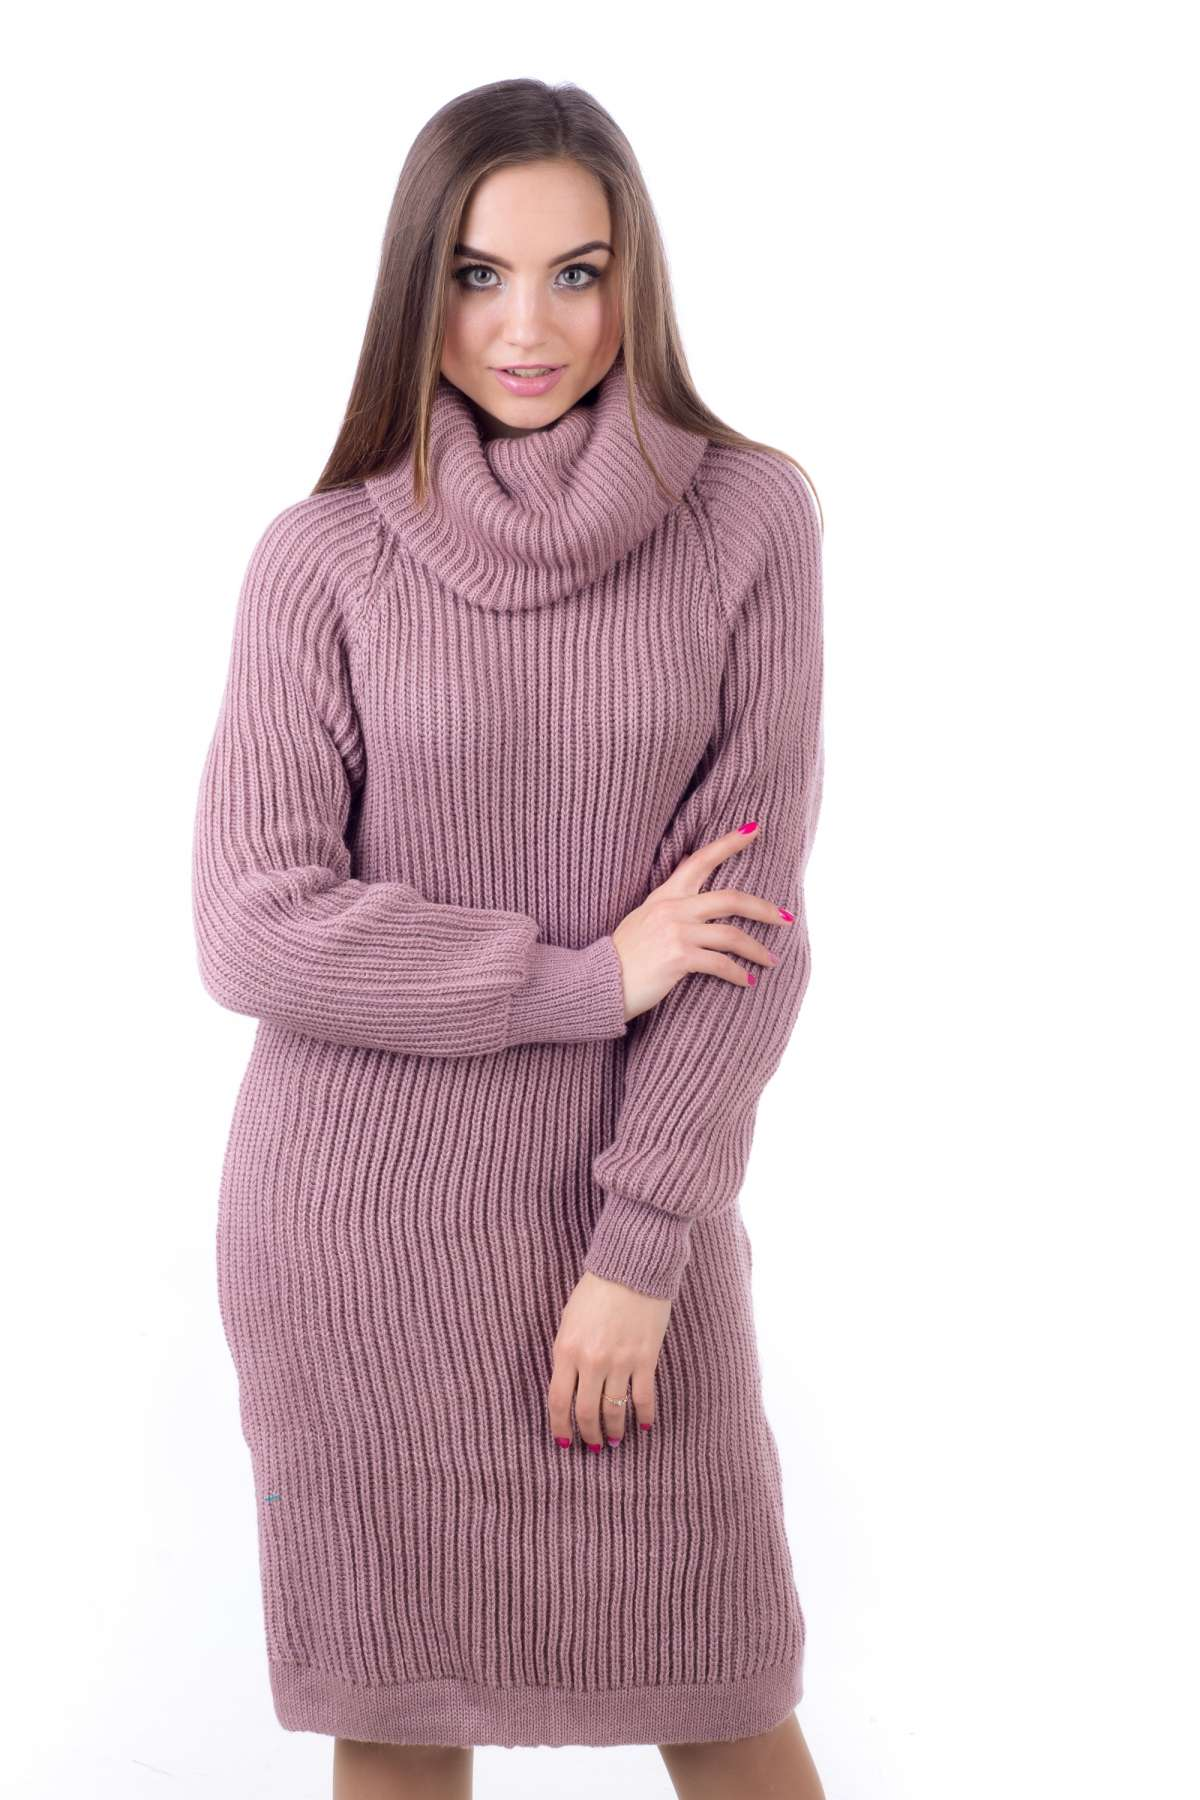 bf924e87348 Теплое вязаное платье-свитер Ласка